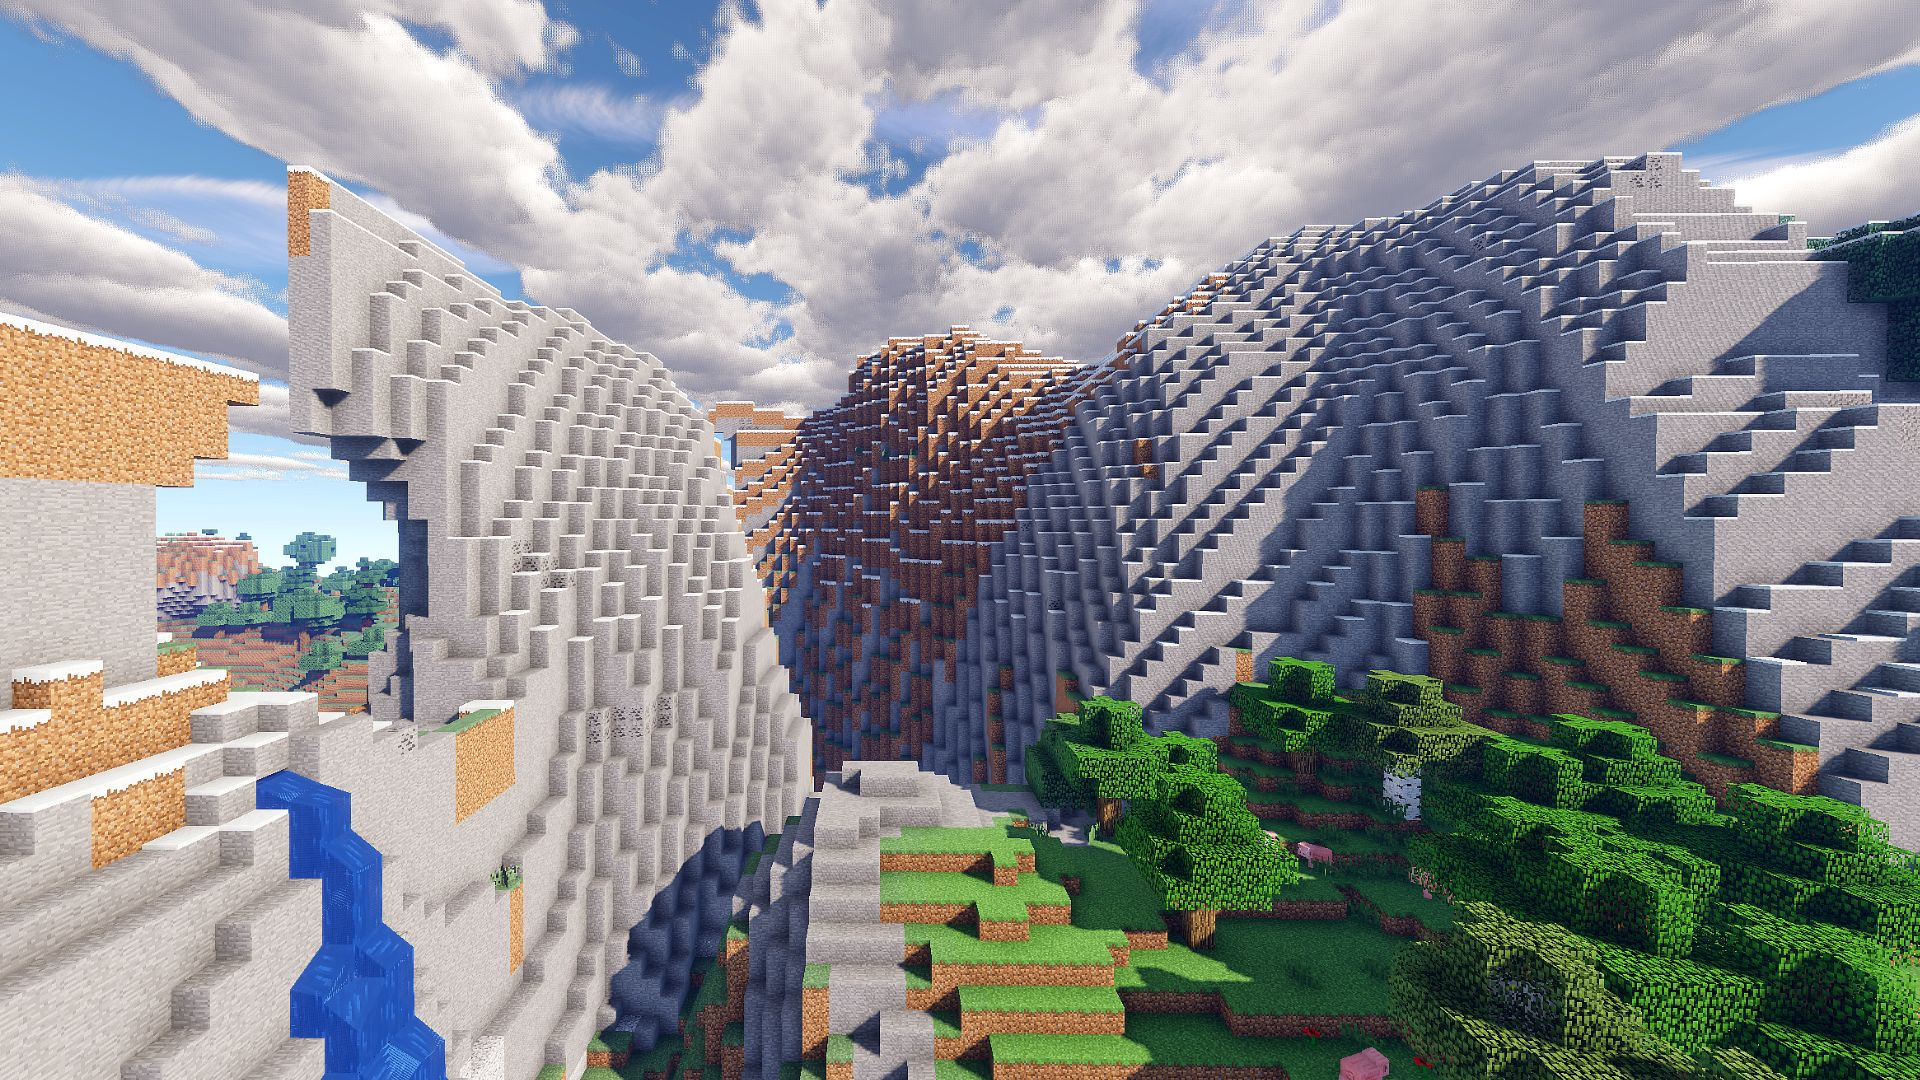 Minecraft shaders: the best Minecraft shader packs in 2020 | PCGamesN